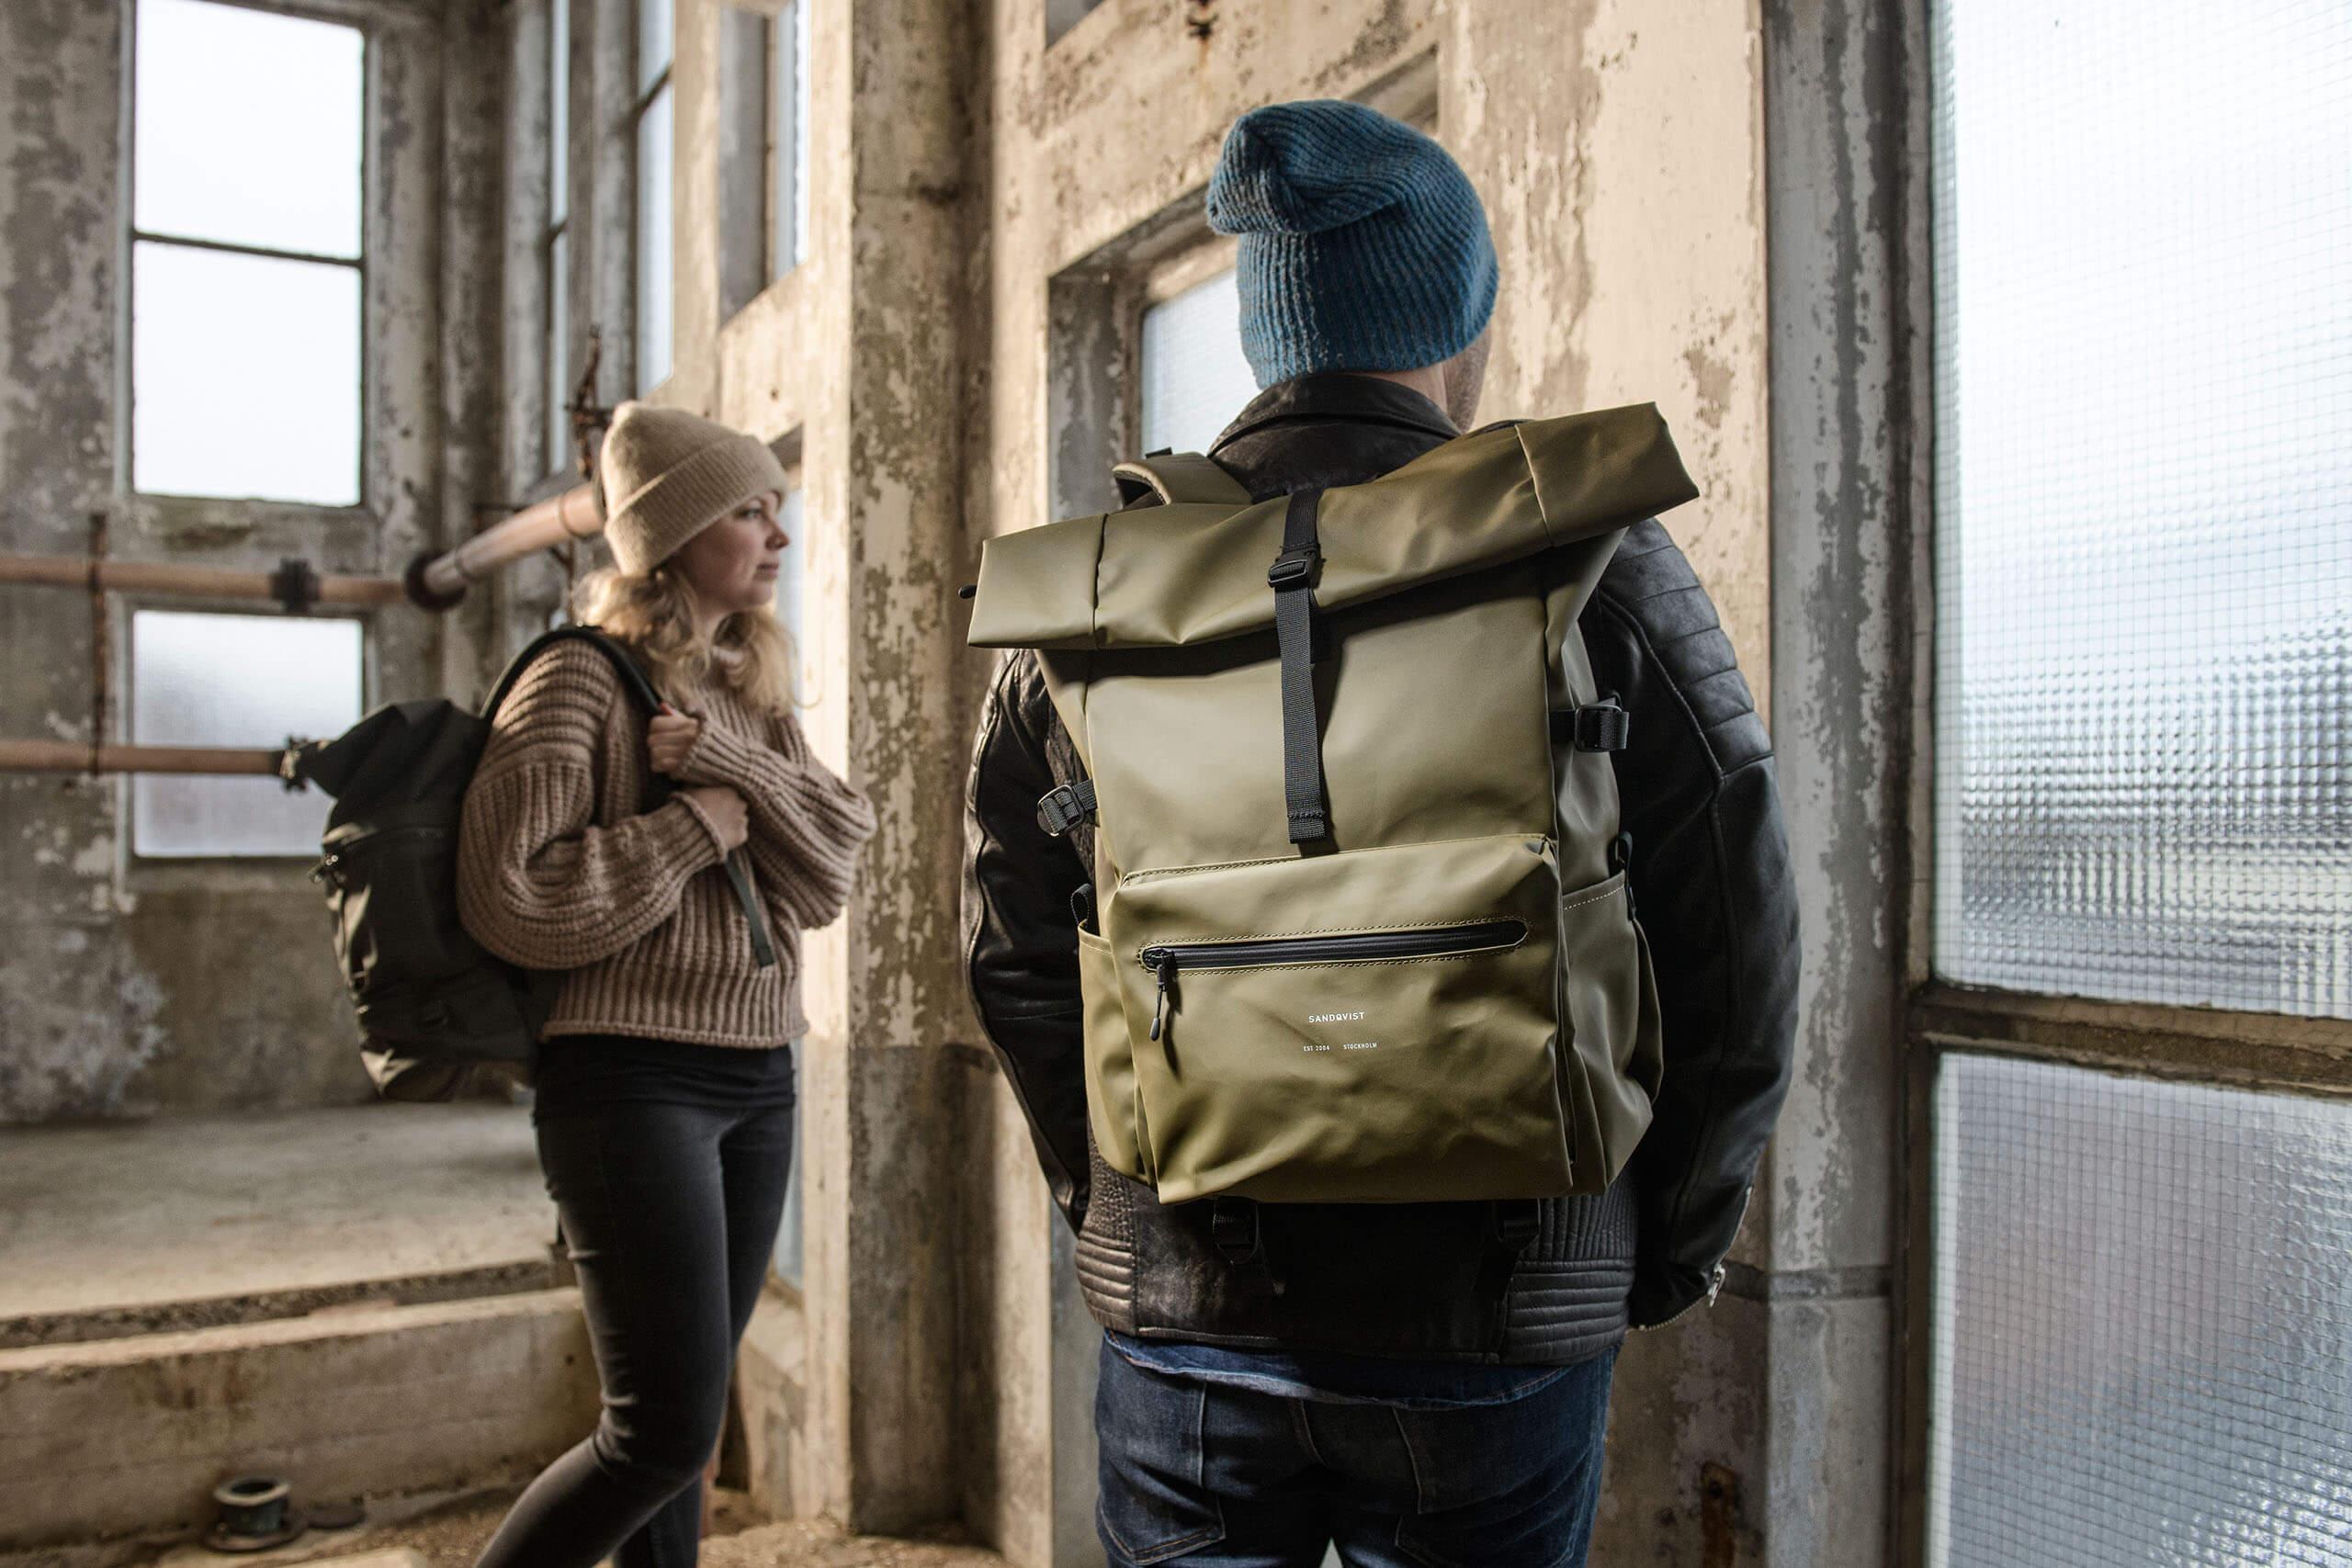 productfotografie merk travelbags sandqvist belevingsfotografie concept